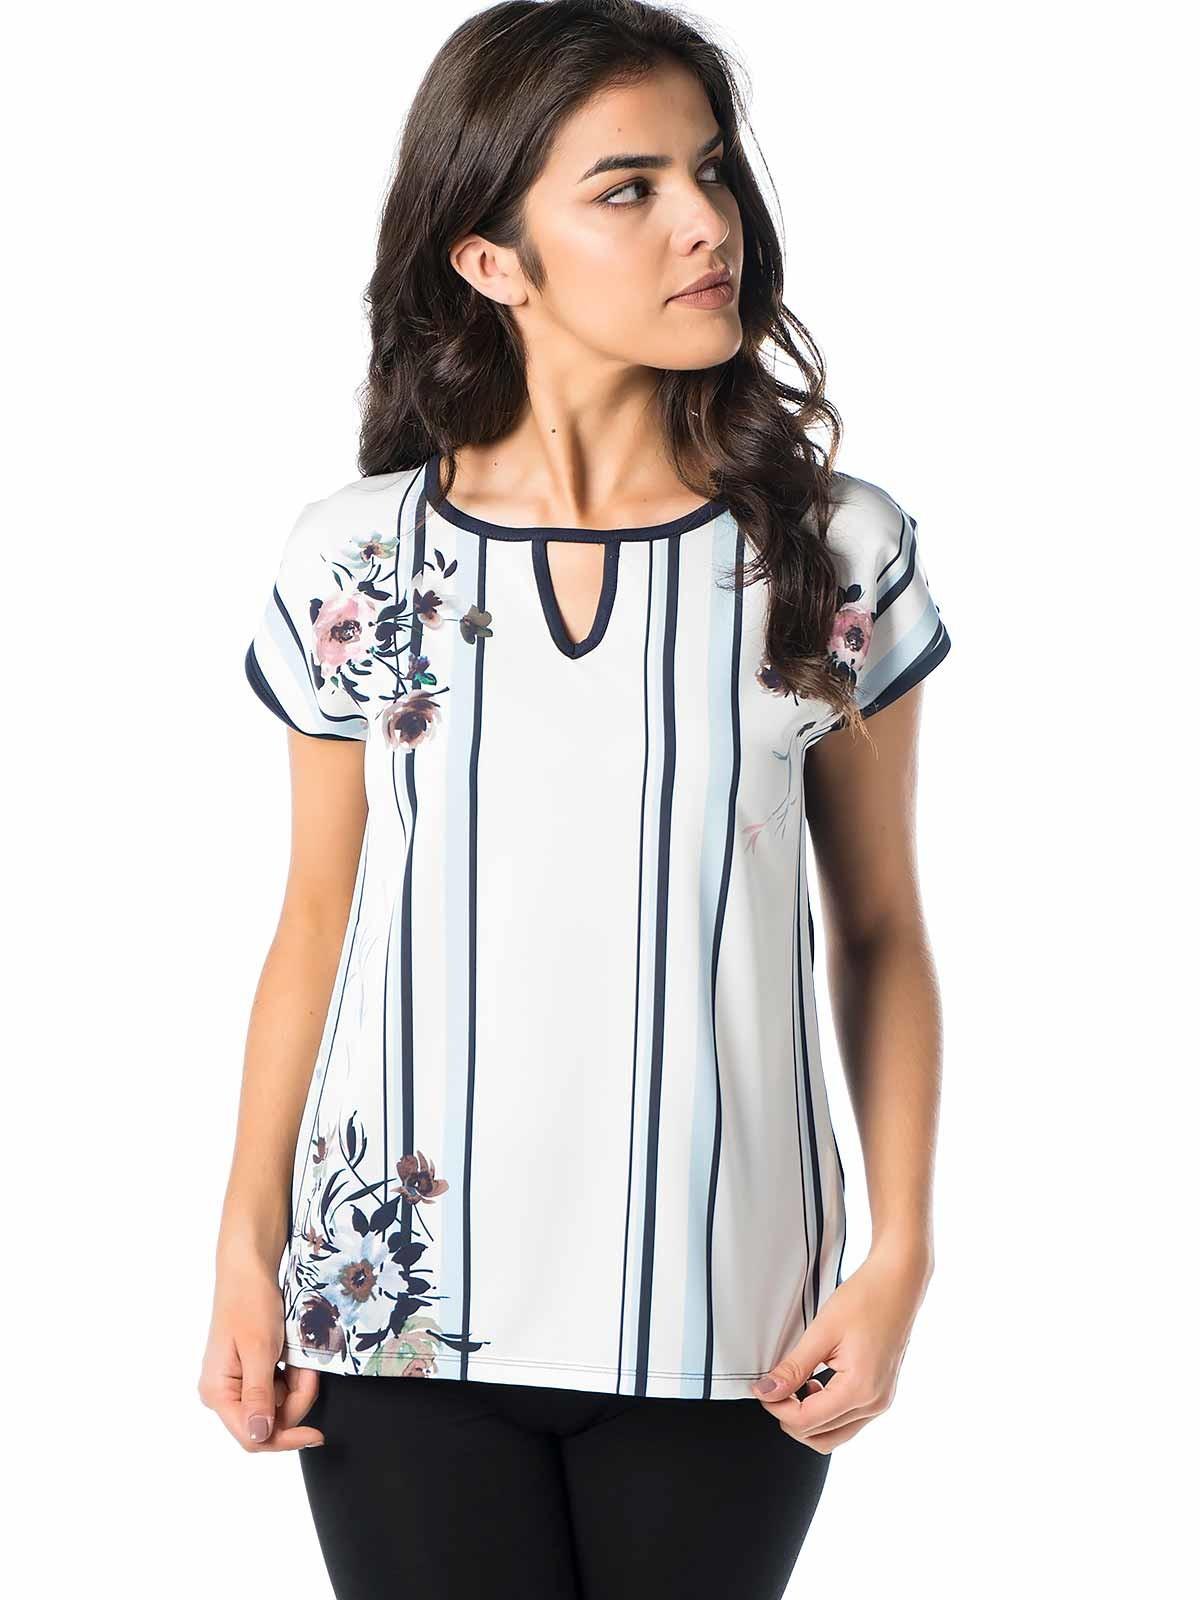 Blusa manga curta floral